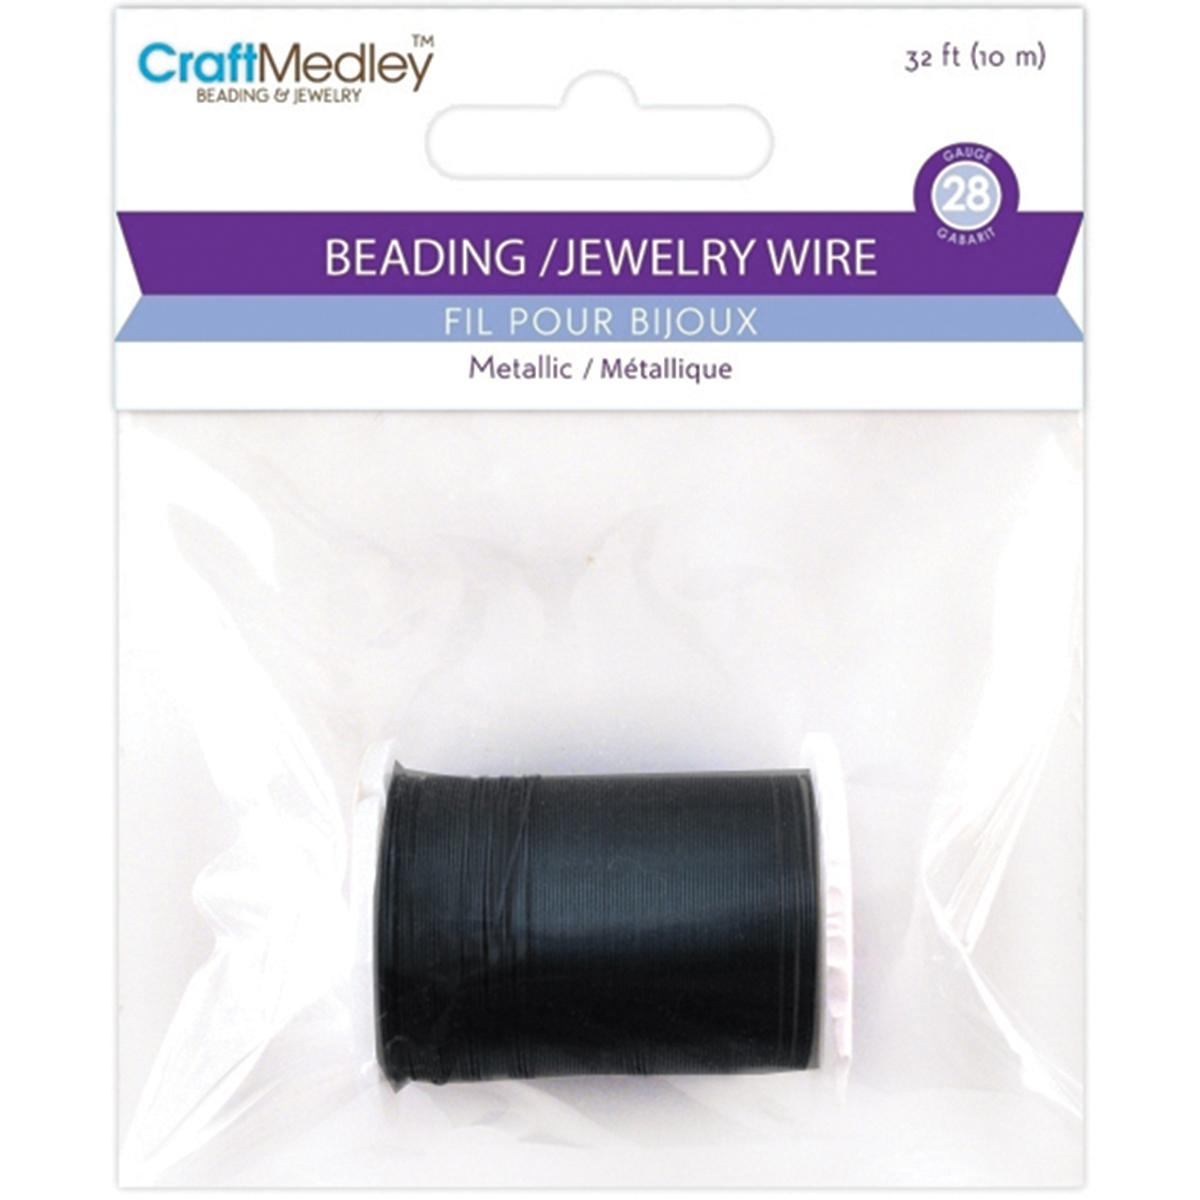 Metallic Beading & Jewelry Wire 28 Gauge 32'-Black